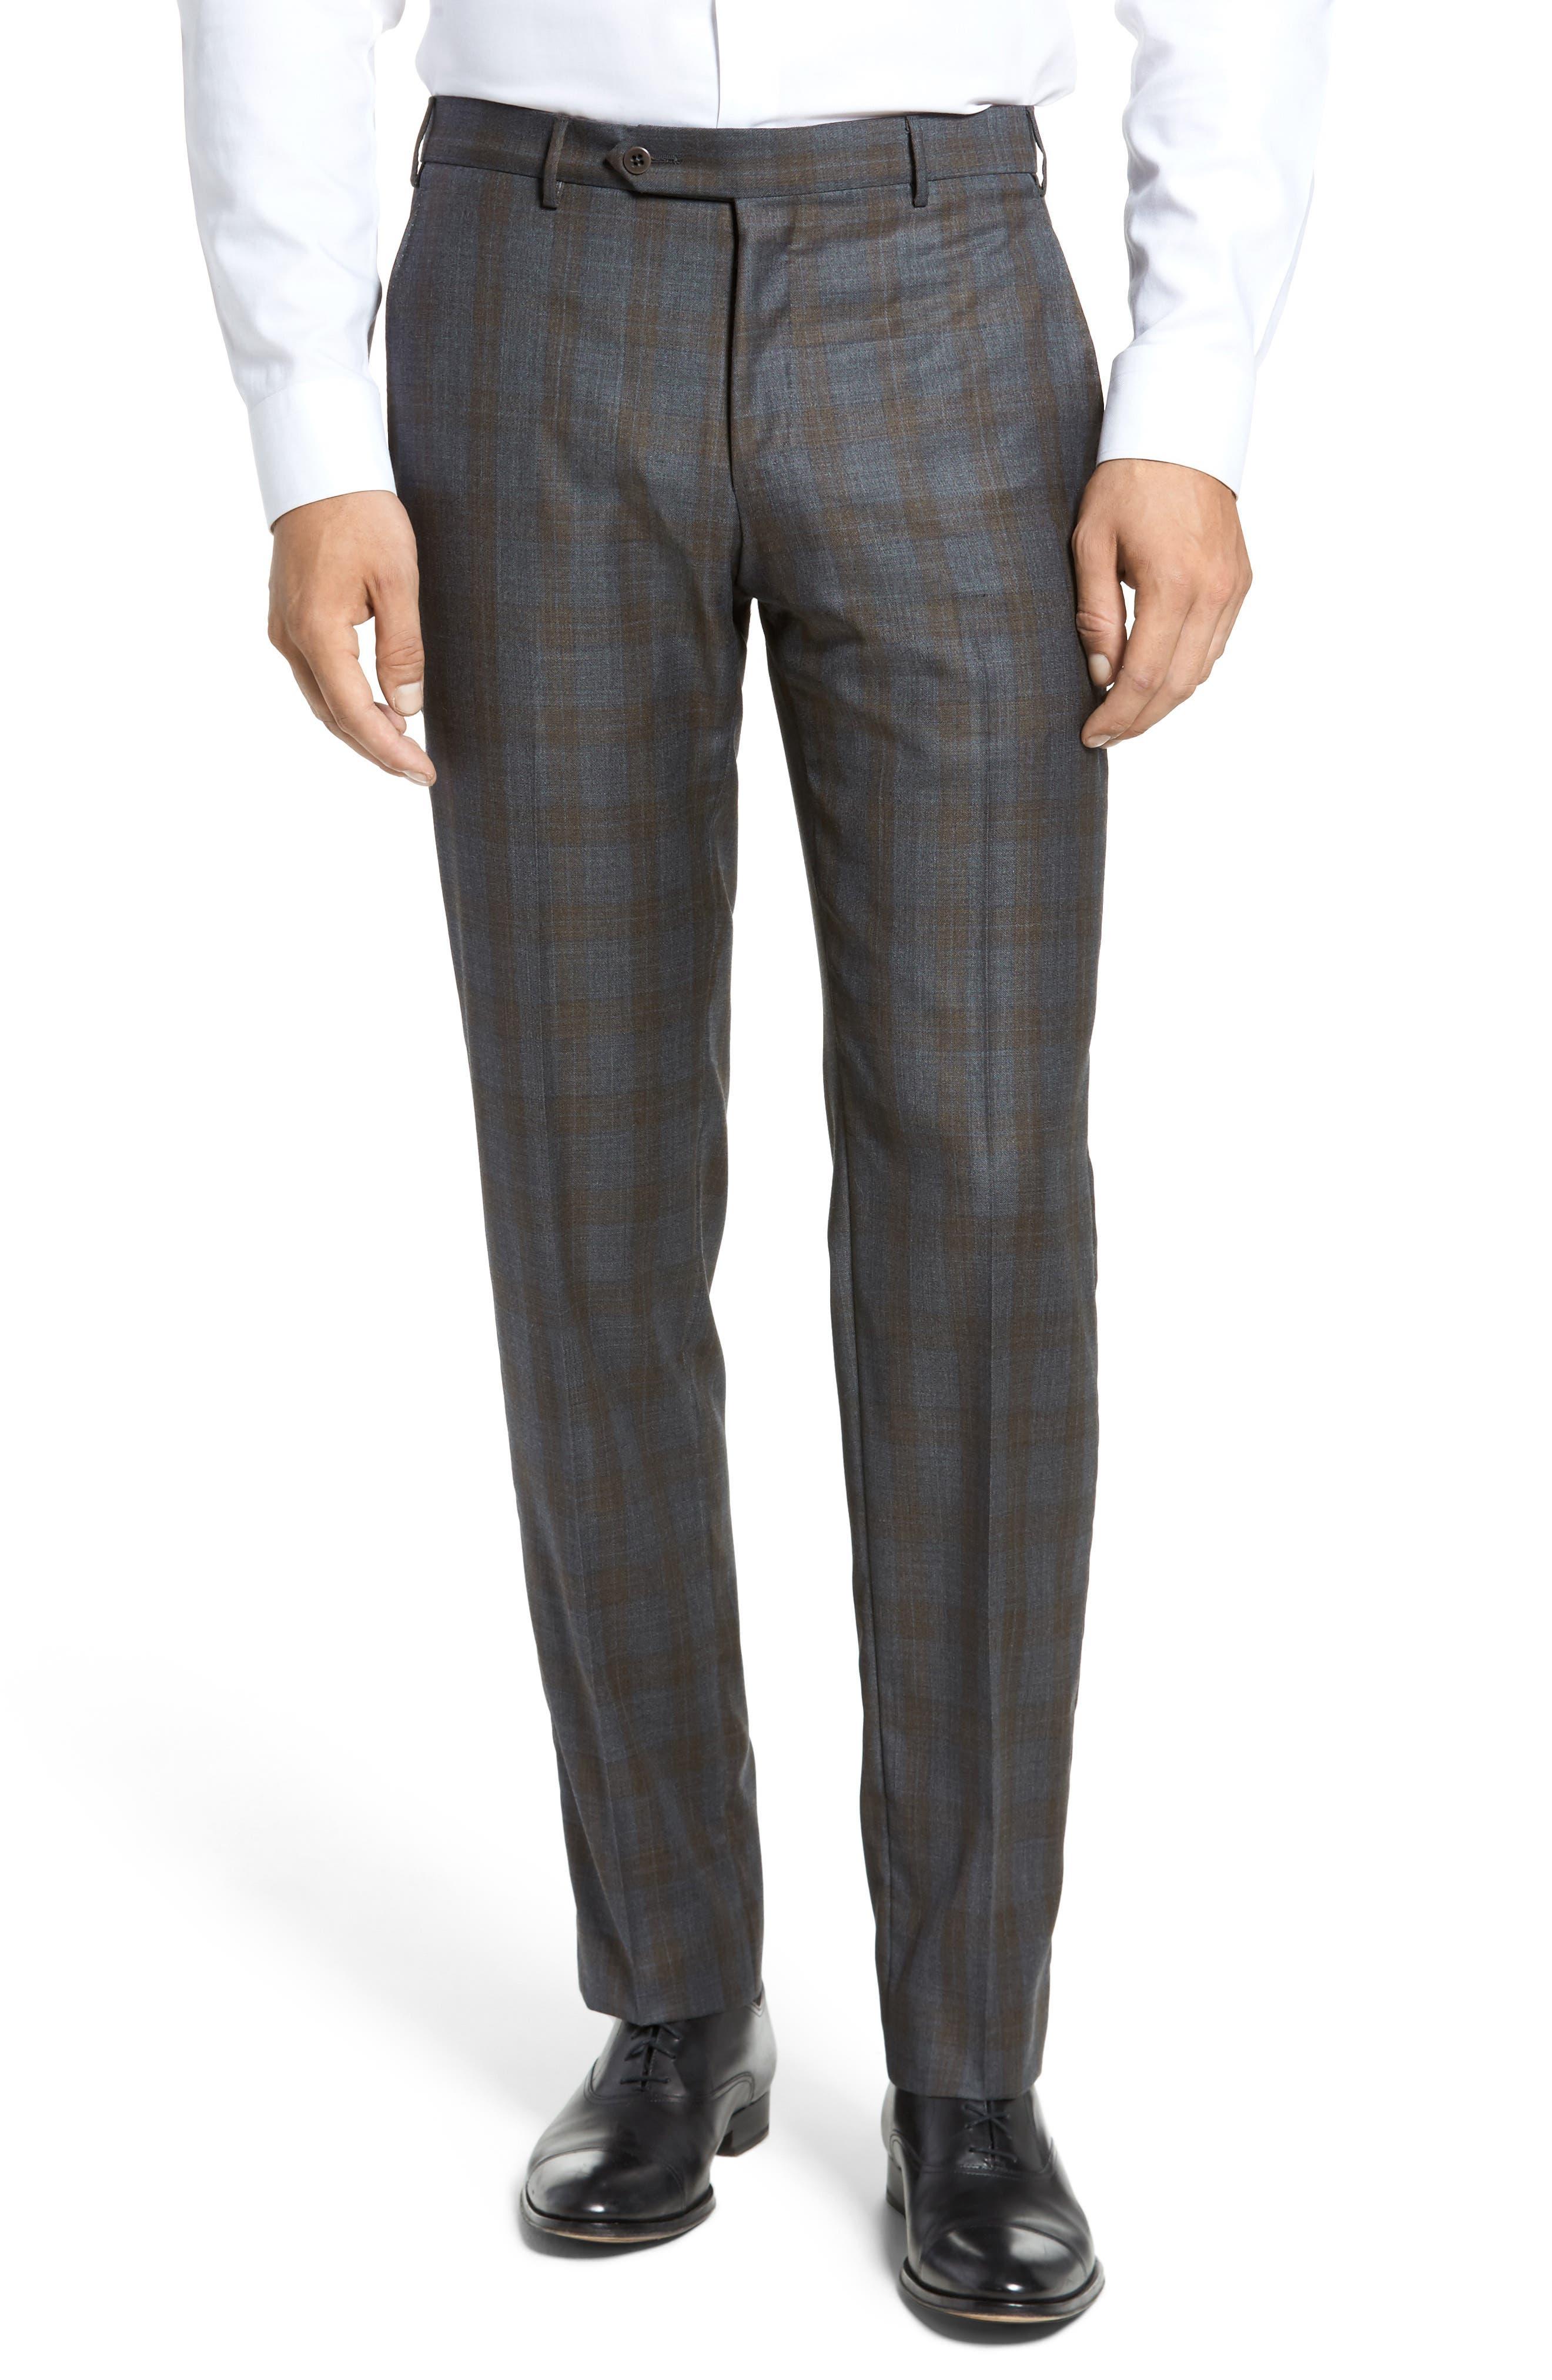 Parker Flat Front Plaid Wool Trousers,                             Main thumbnail 1, color,                             021